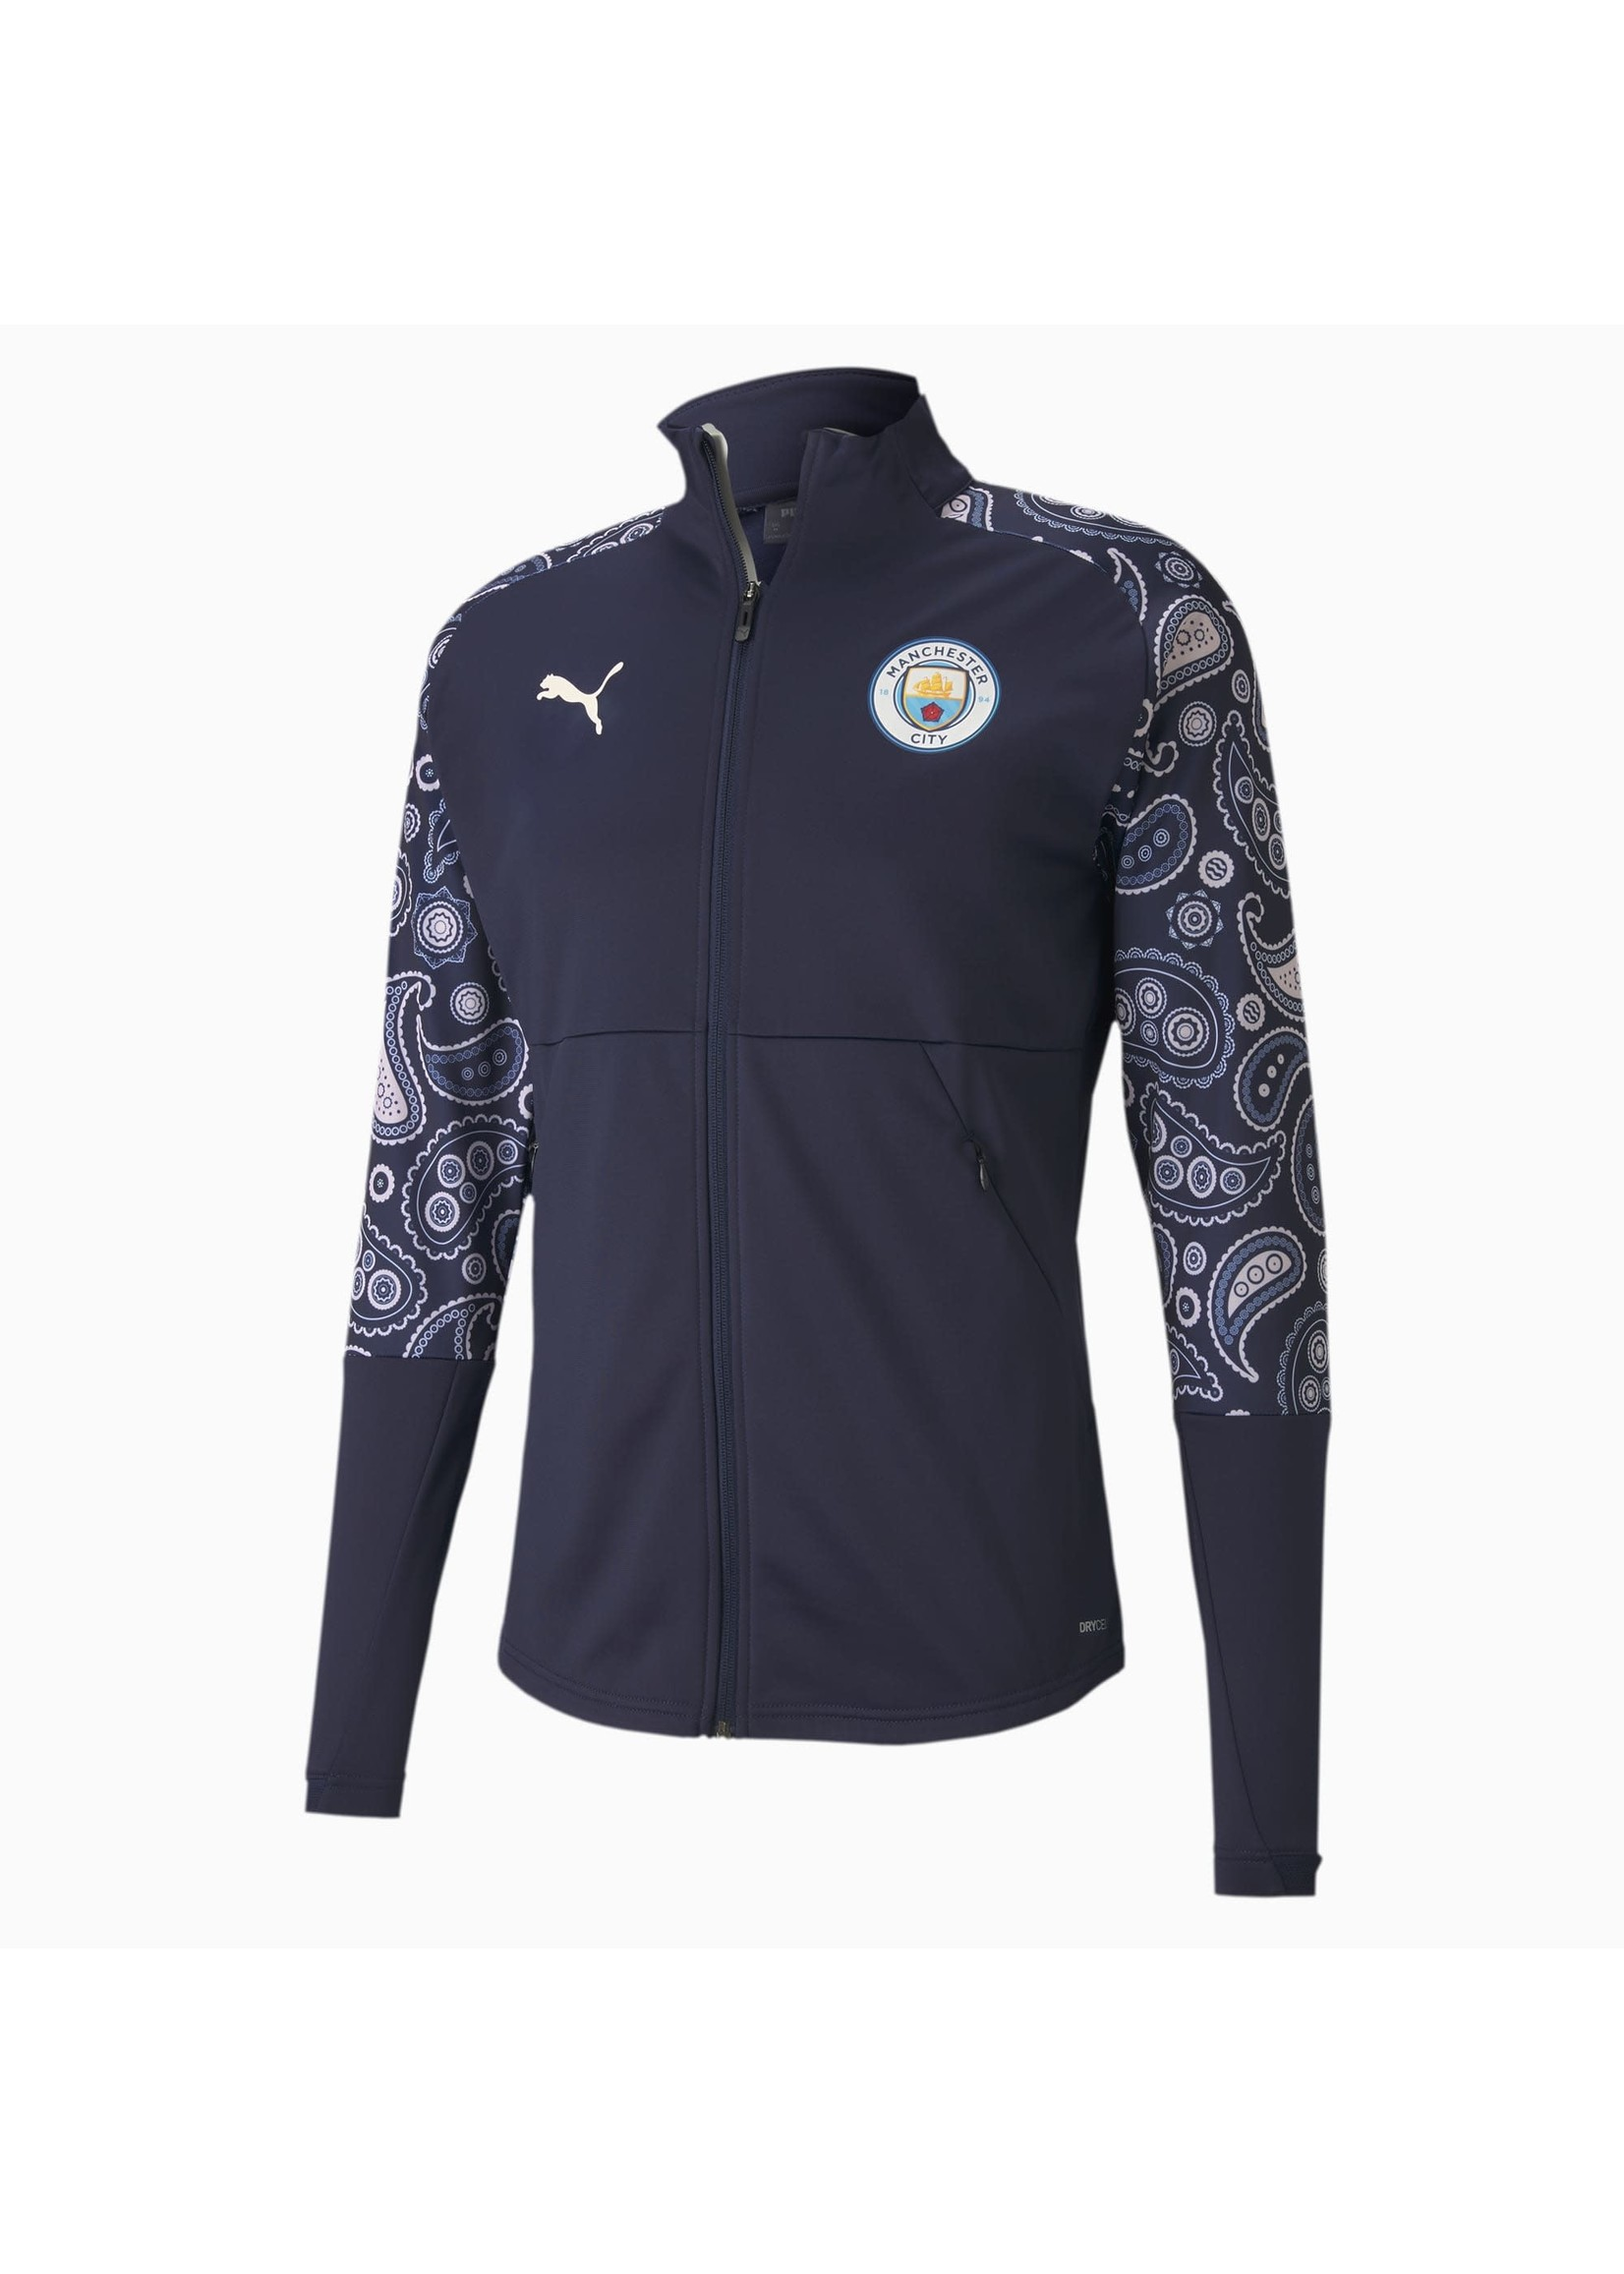 Puma Manchester City Stadium Track Jacket - 20/21 Third